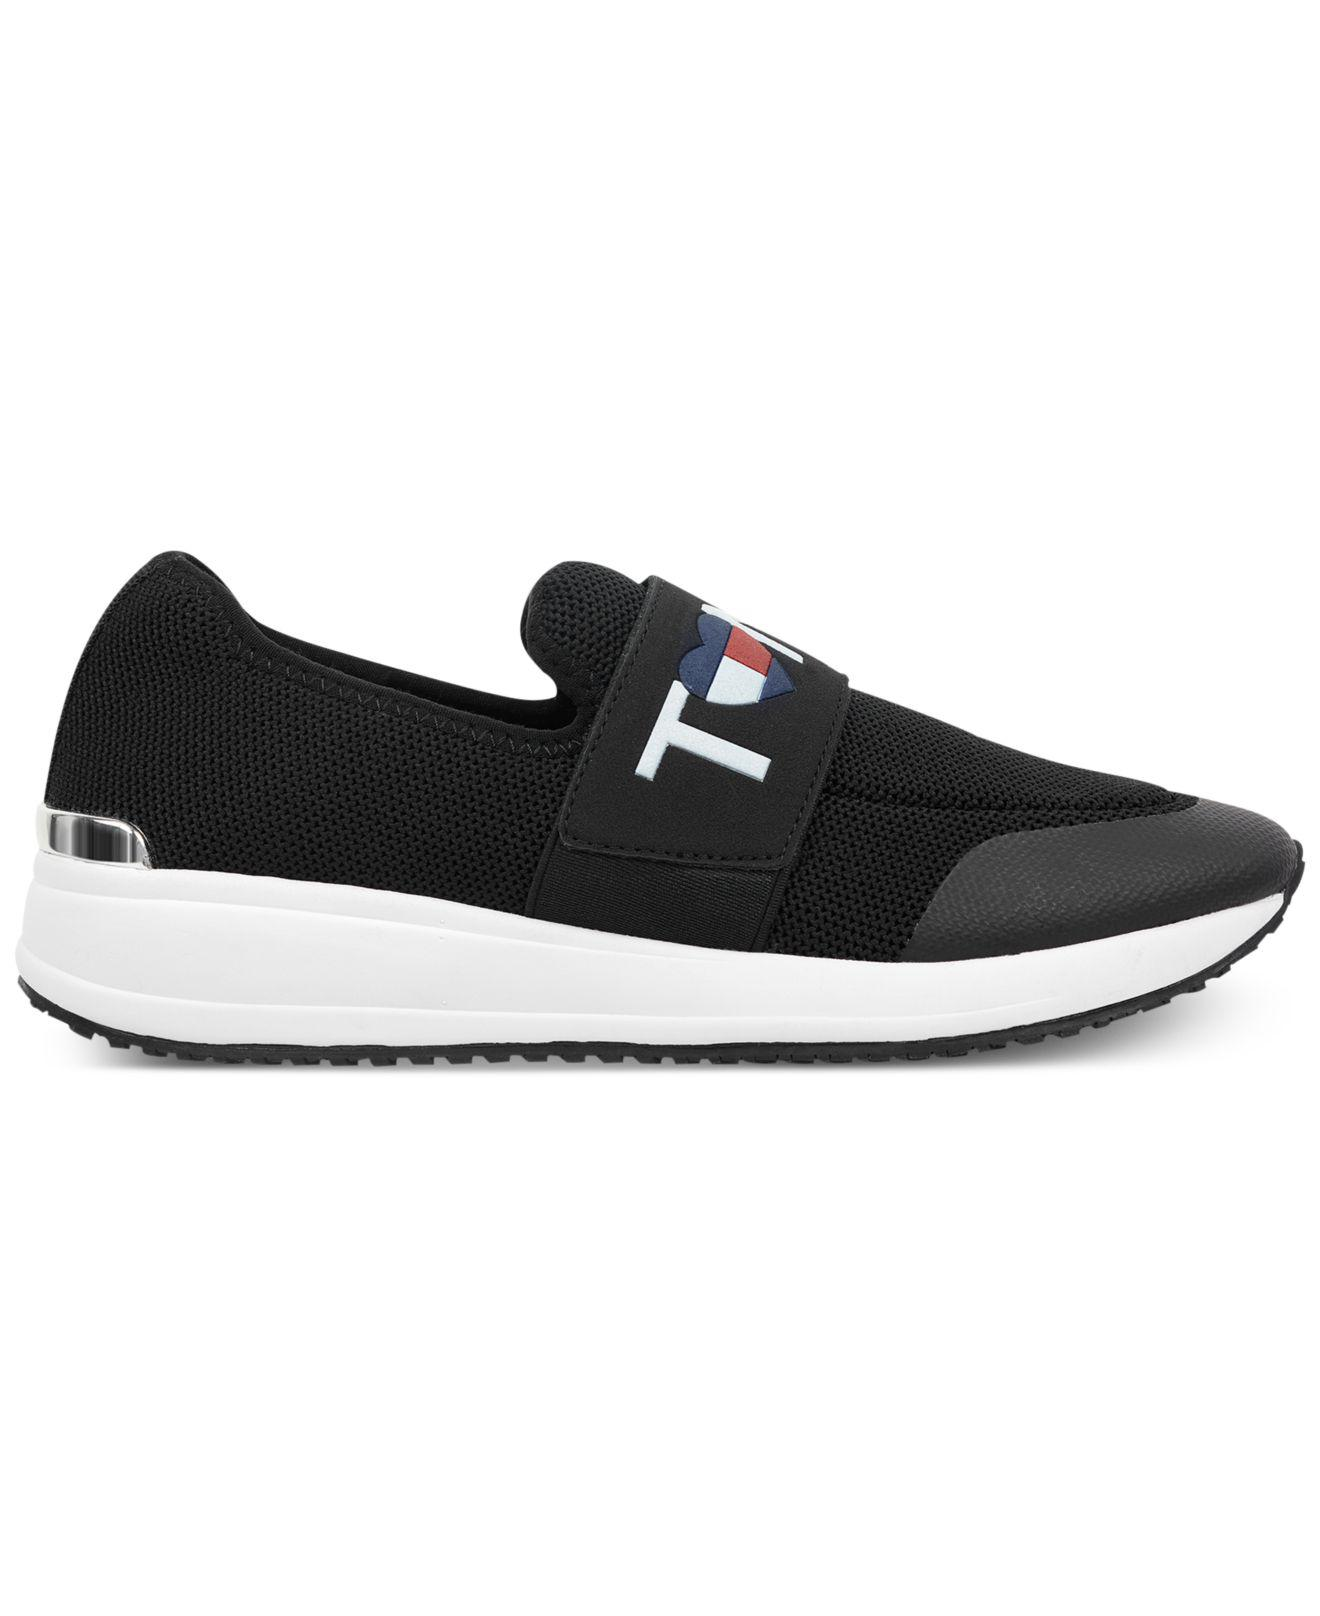 5d6f7d59f Lyst - Tommy Hilfiger Rosin Slip-on Fashion Sneakers in Black